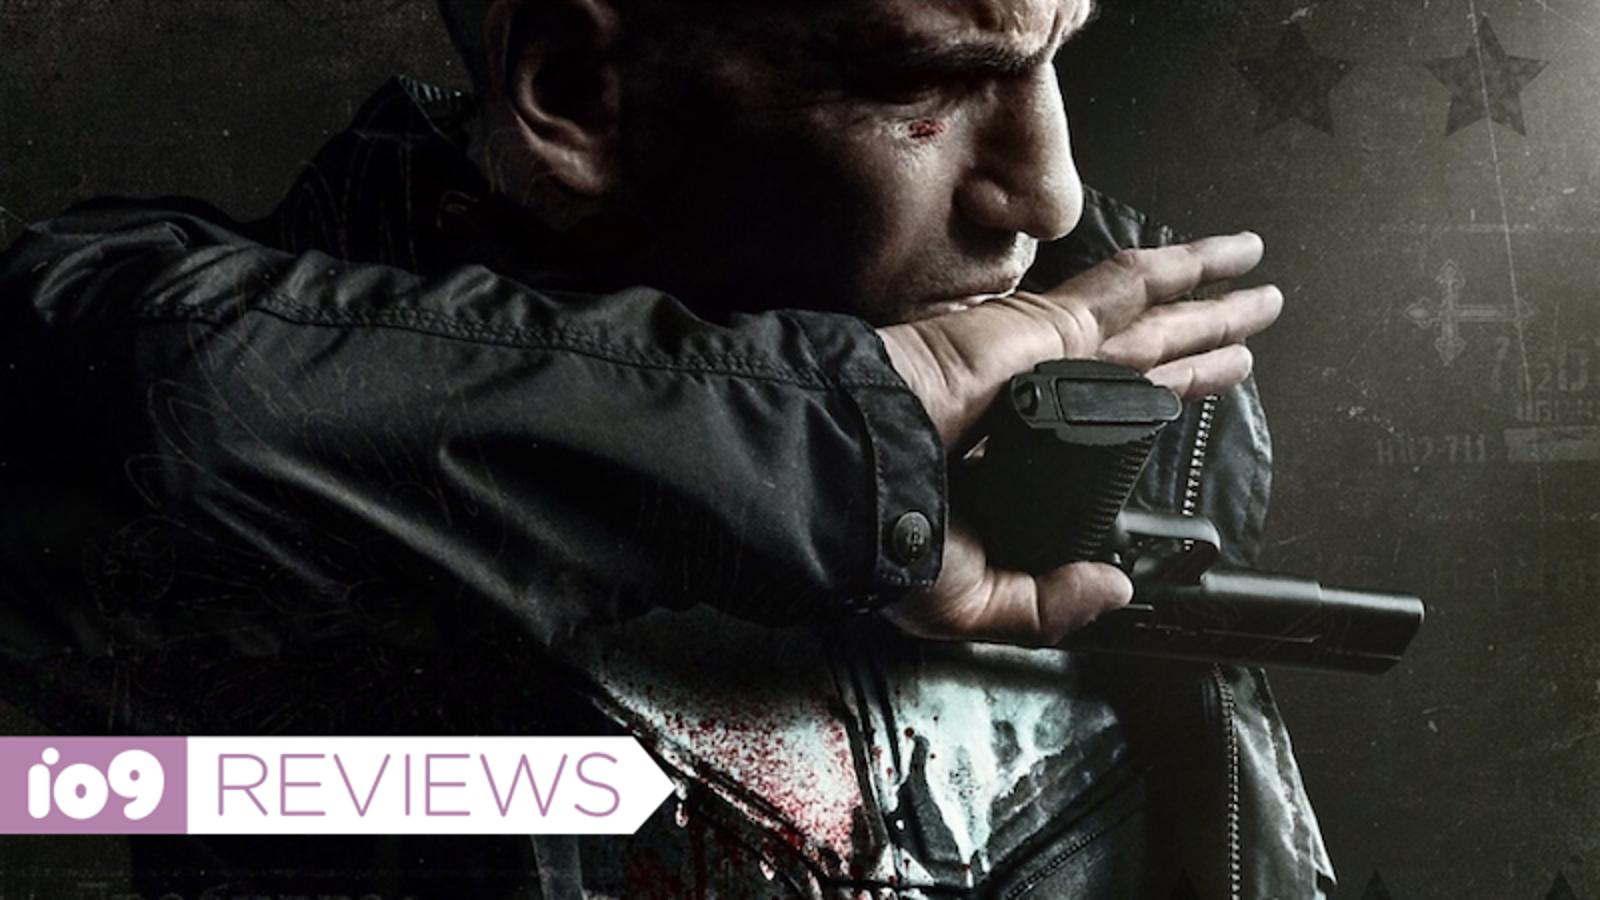 The Punisher Season 2 Wants to Make Frank Castle a Superhero